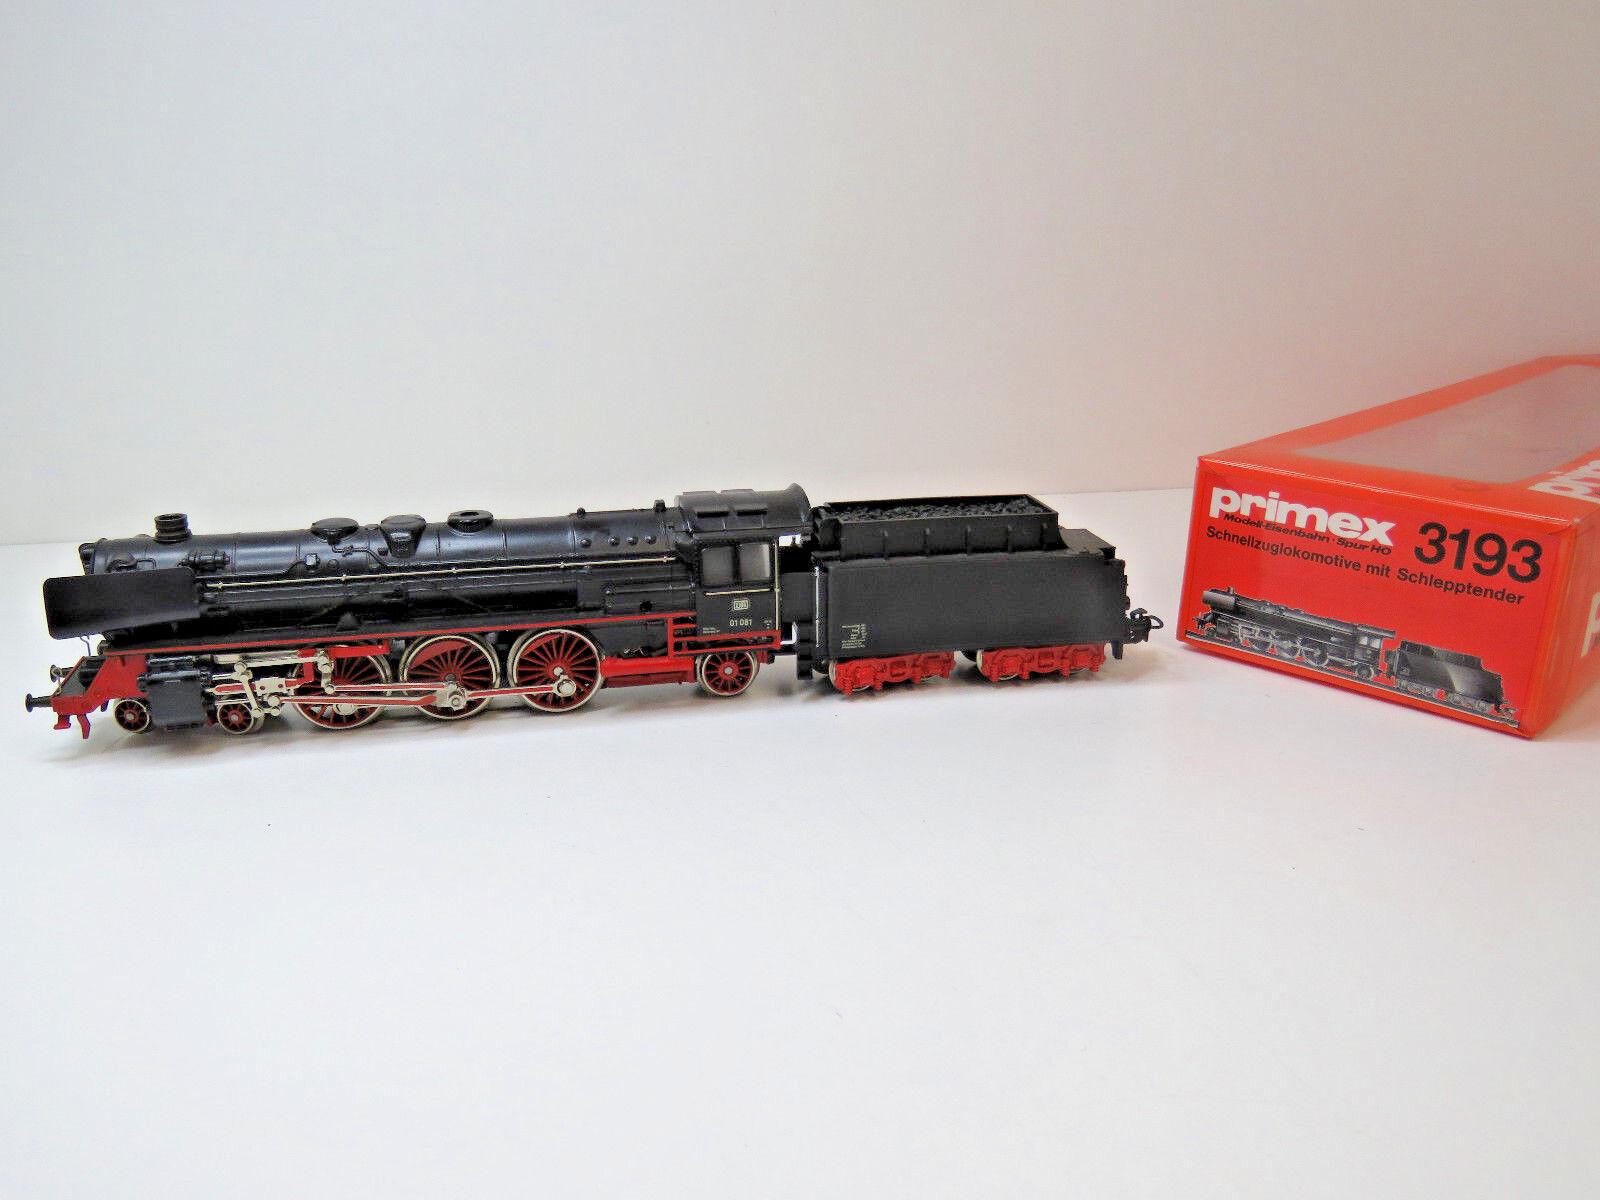 Locomotiva BR 01 081 delle DB, Epoca III,  /PRIMEX, OVP, 3193, HB